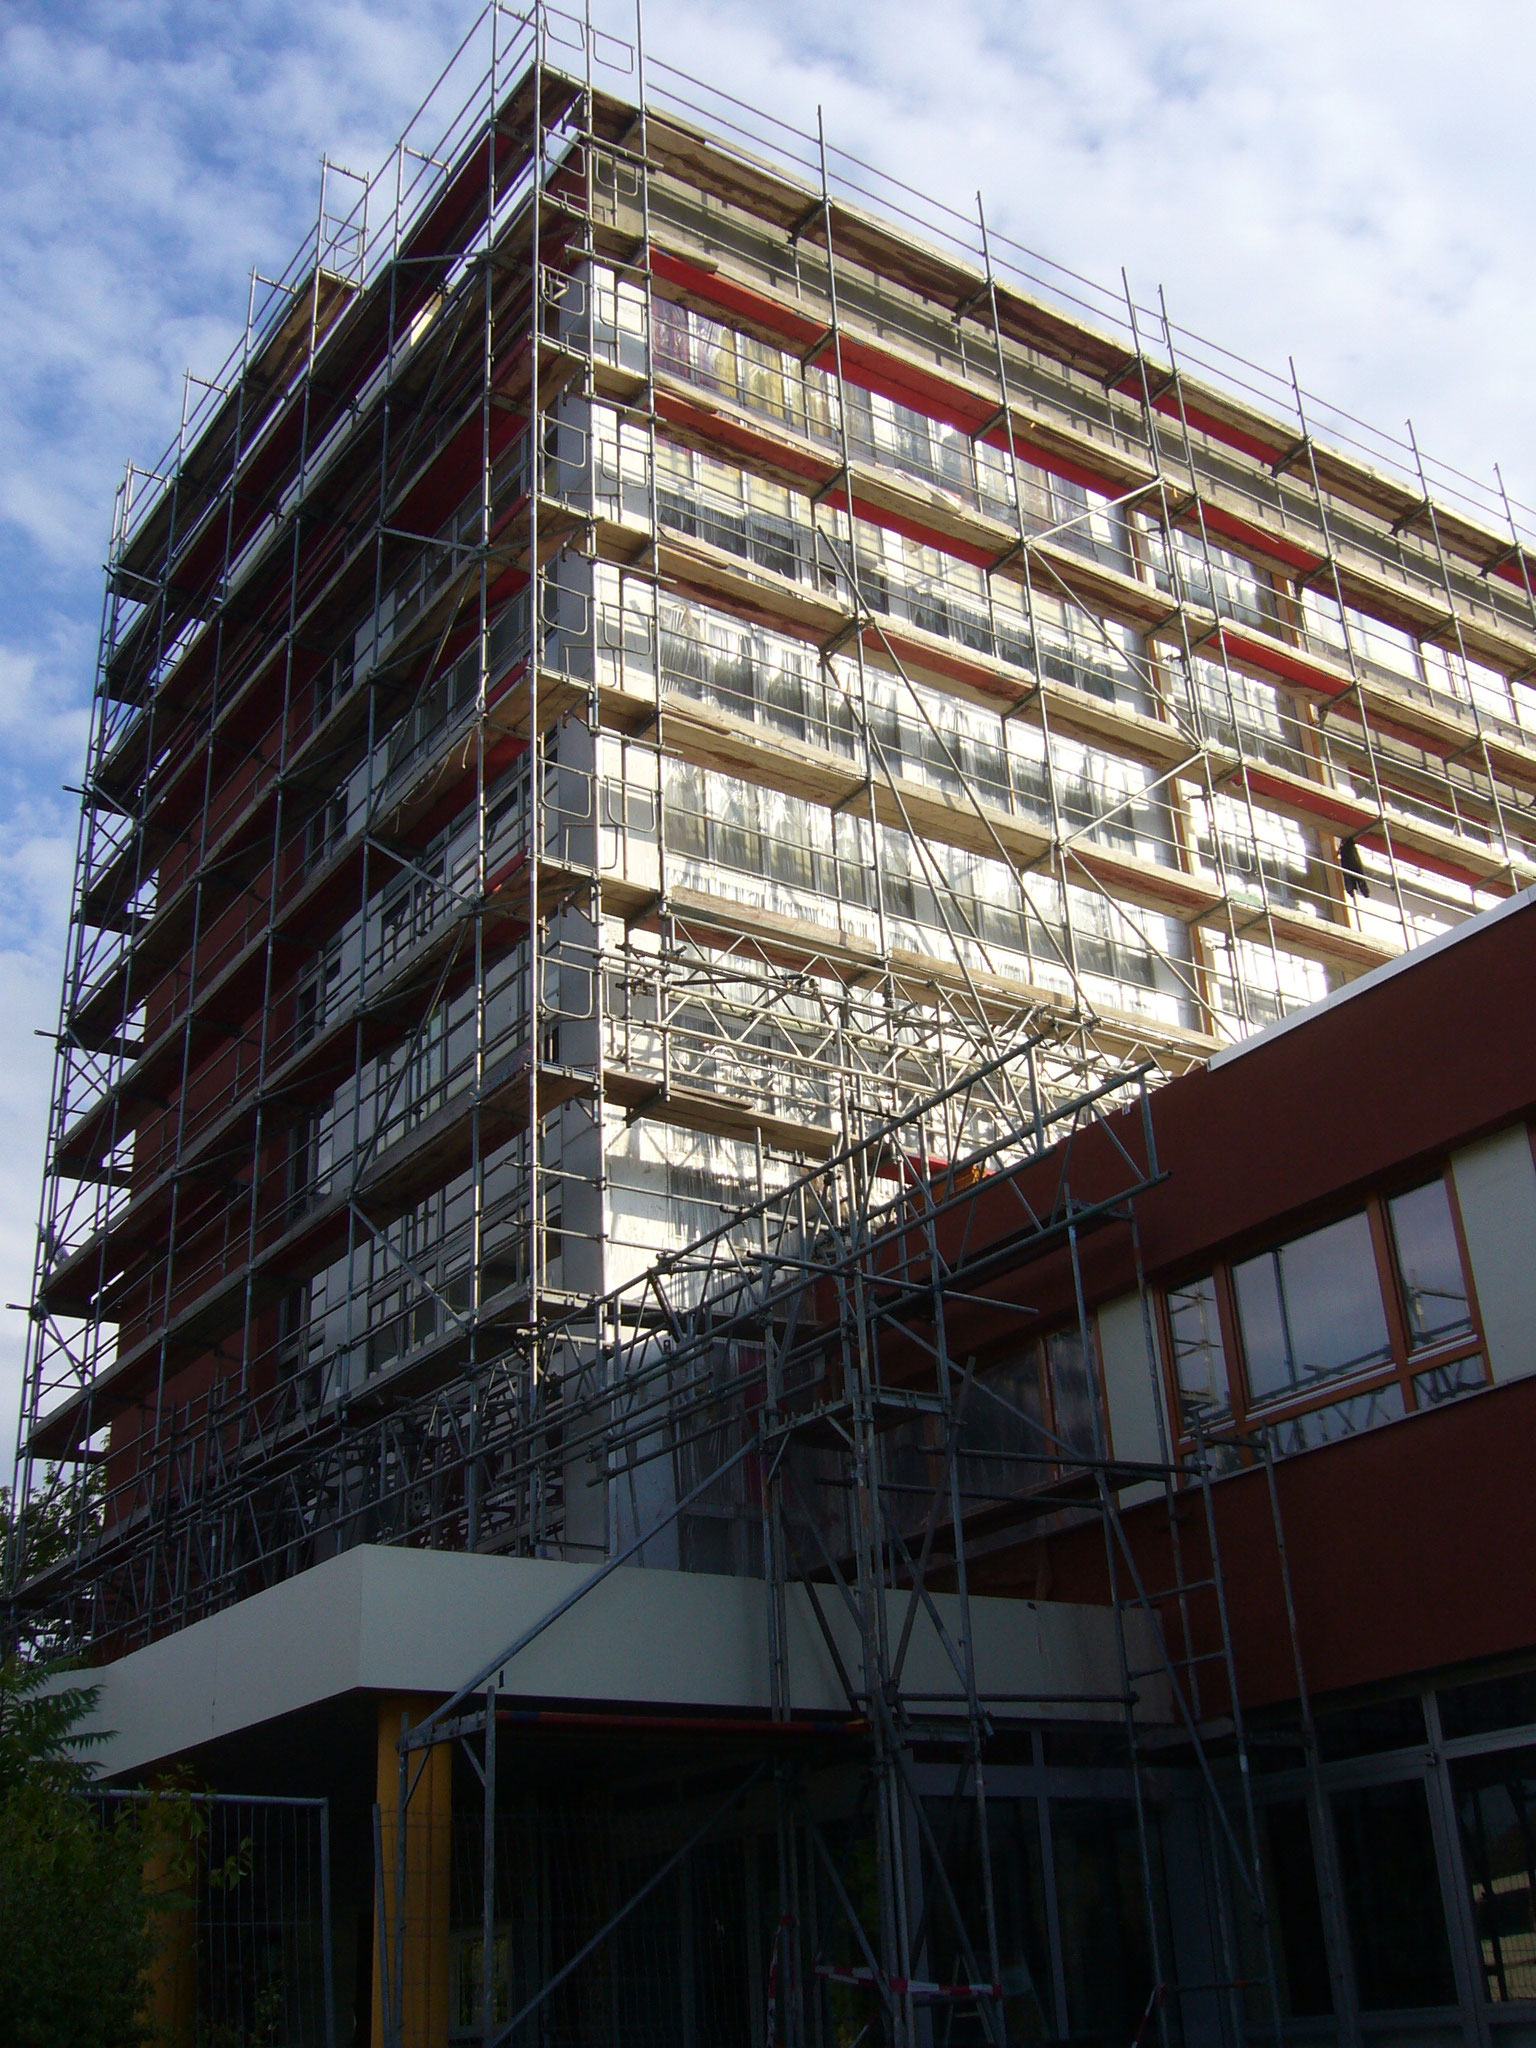 Gesundheitszentrum Teltow ca. 4000m² Fassadengerüst Lastklasse 3